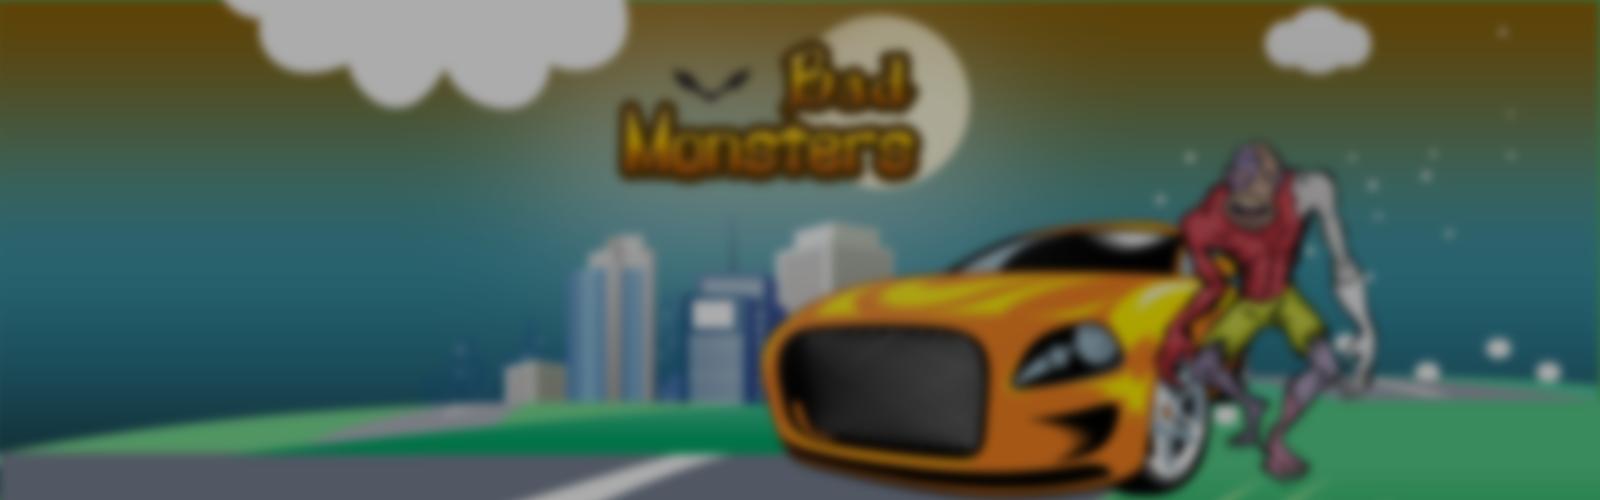 Mobile App Development Background 3